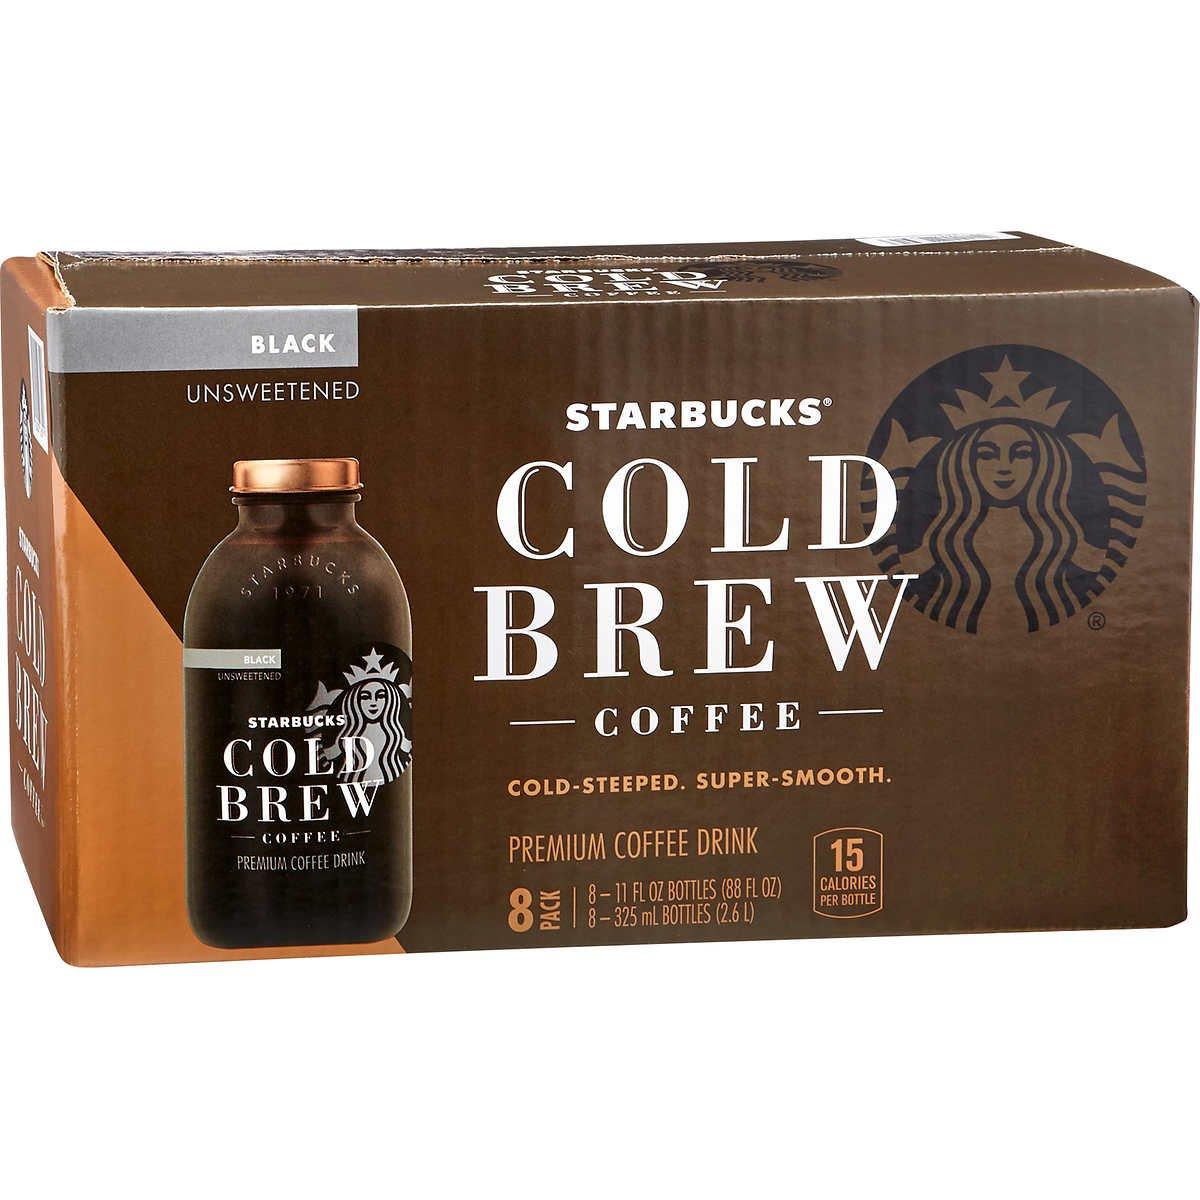 Starbucks Cold Brew Premium Black Coffee Drink, Unsweetened, 11 oz (8-Pack) by Starbucks